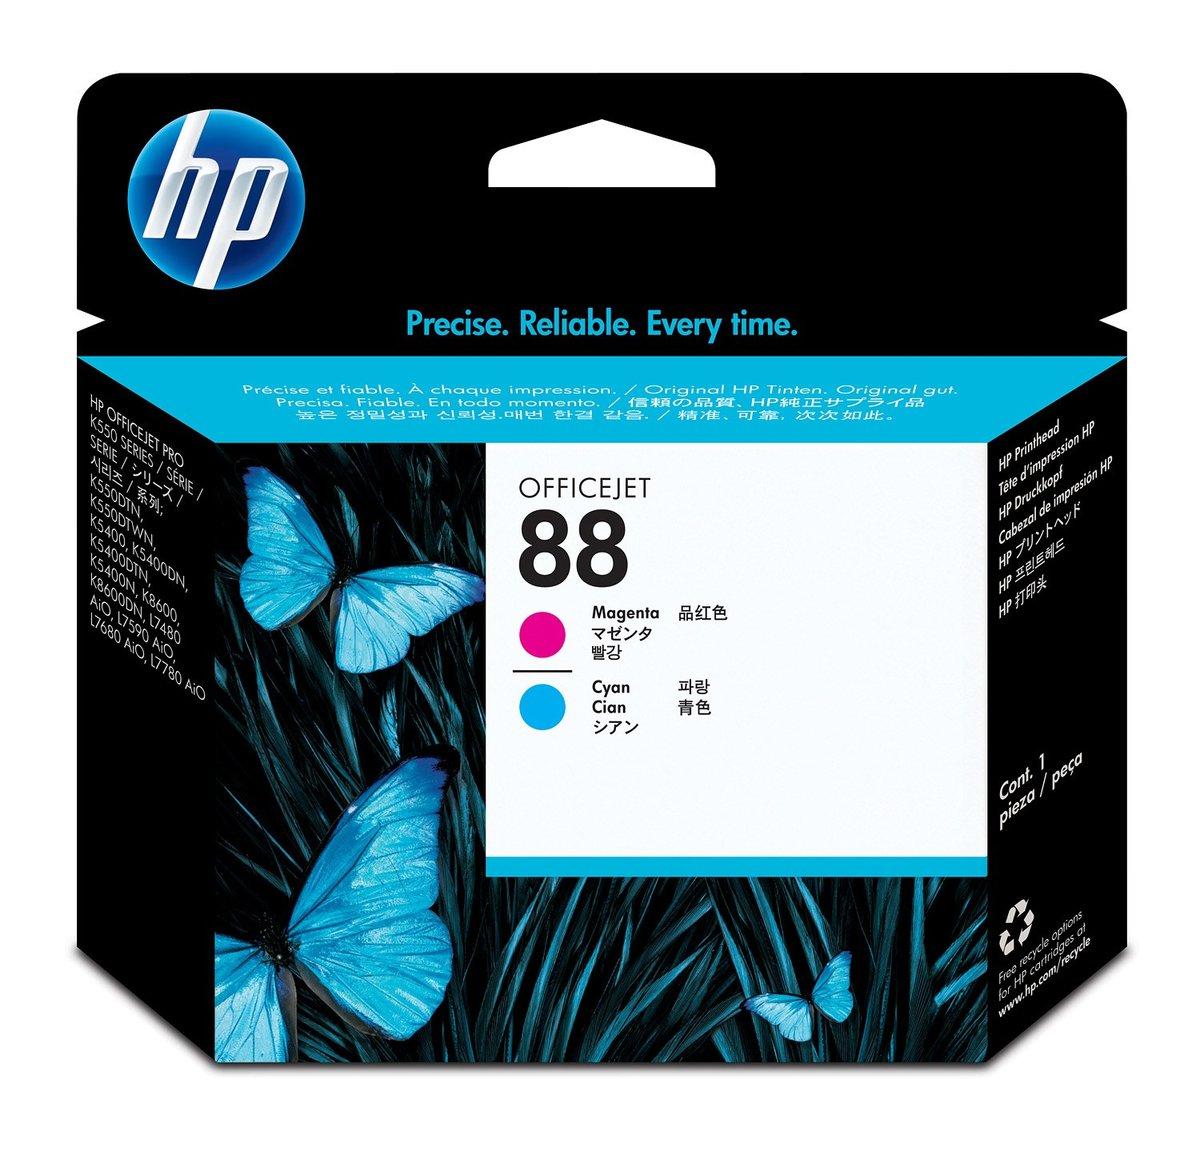 PROVANTAGE: HP C9382A HP 88 Magenta/Cyan Printhead for Officejet Pro K550